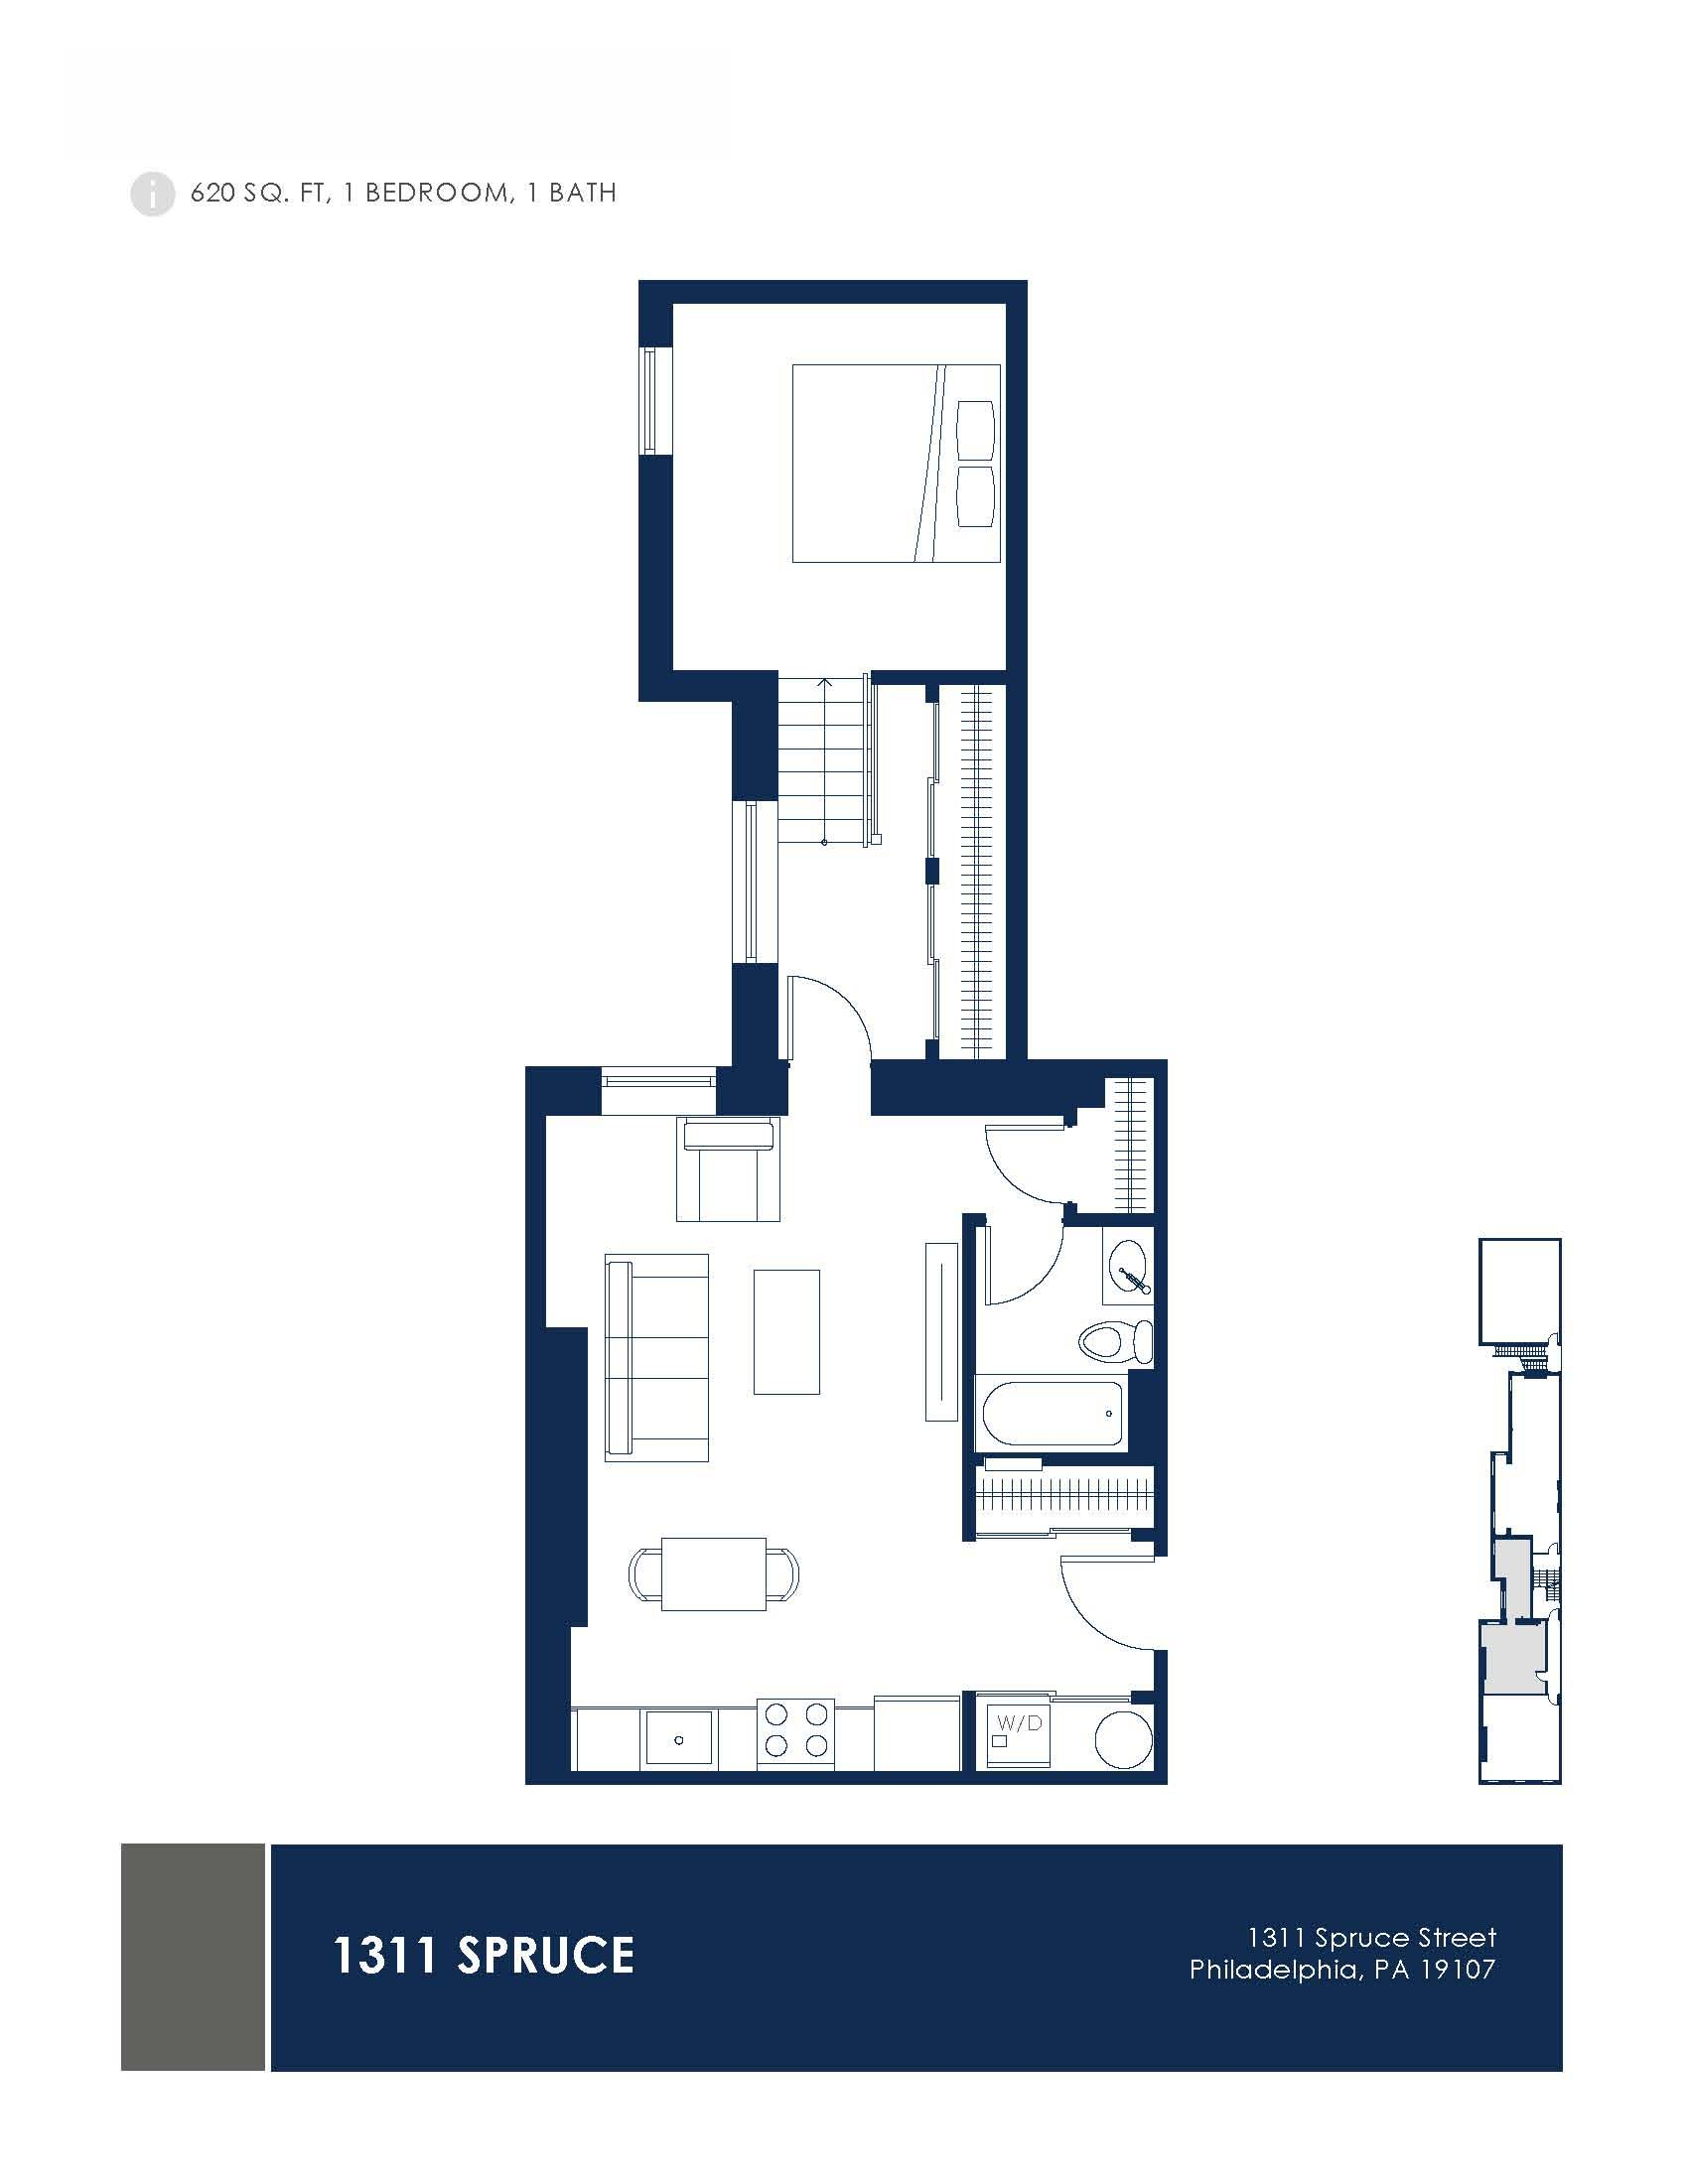 1311 Spruce Lofts Floor Plans